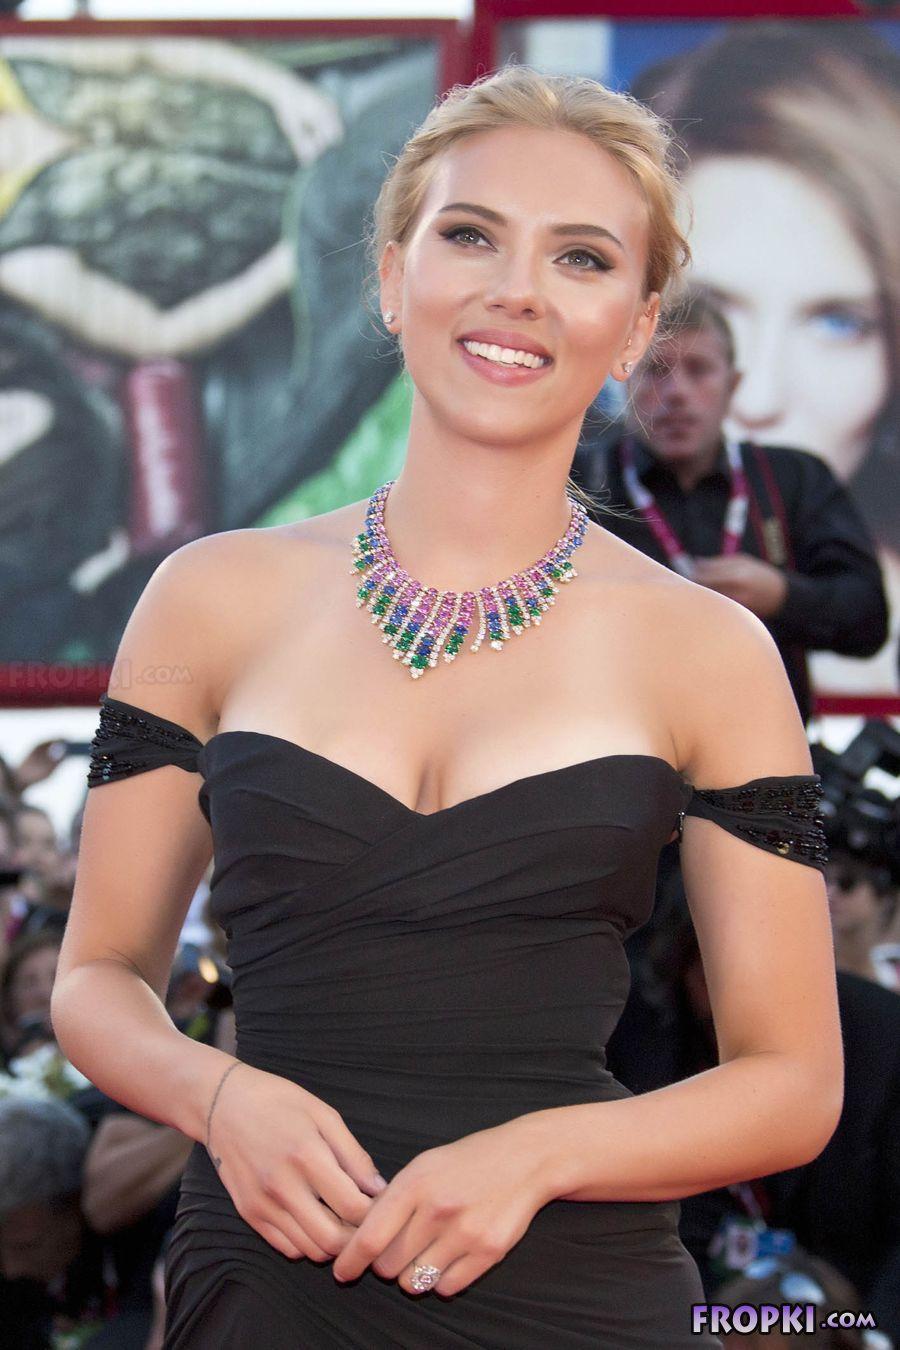 Scarlett Johansson Fropki 08